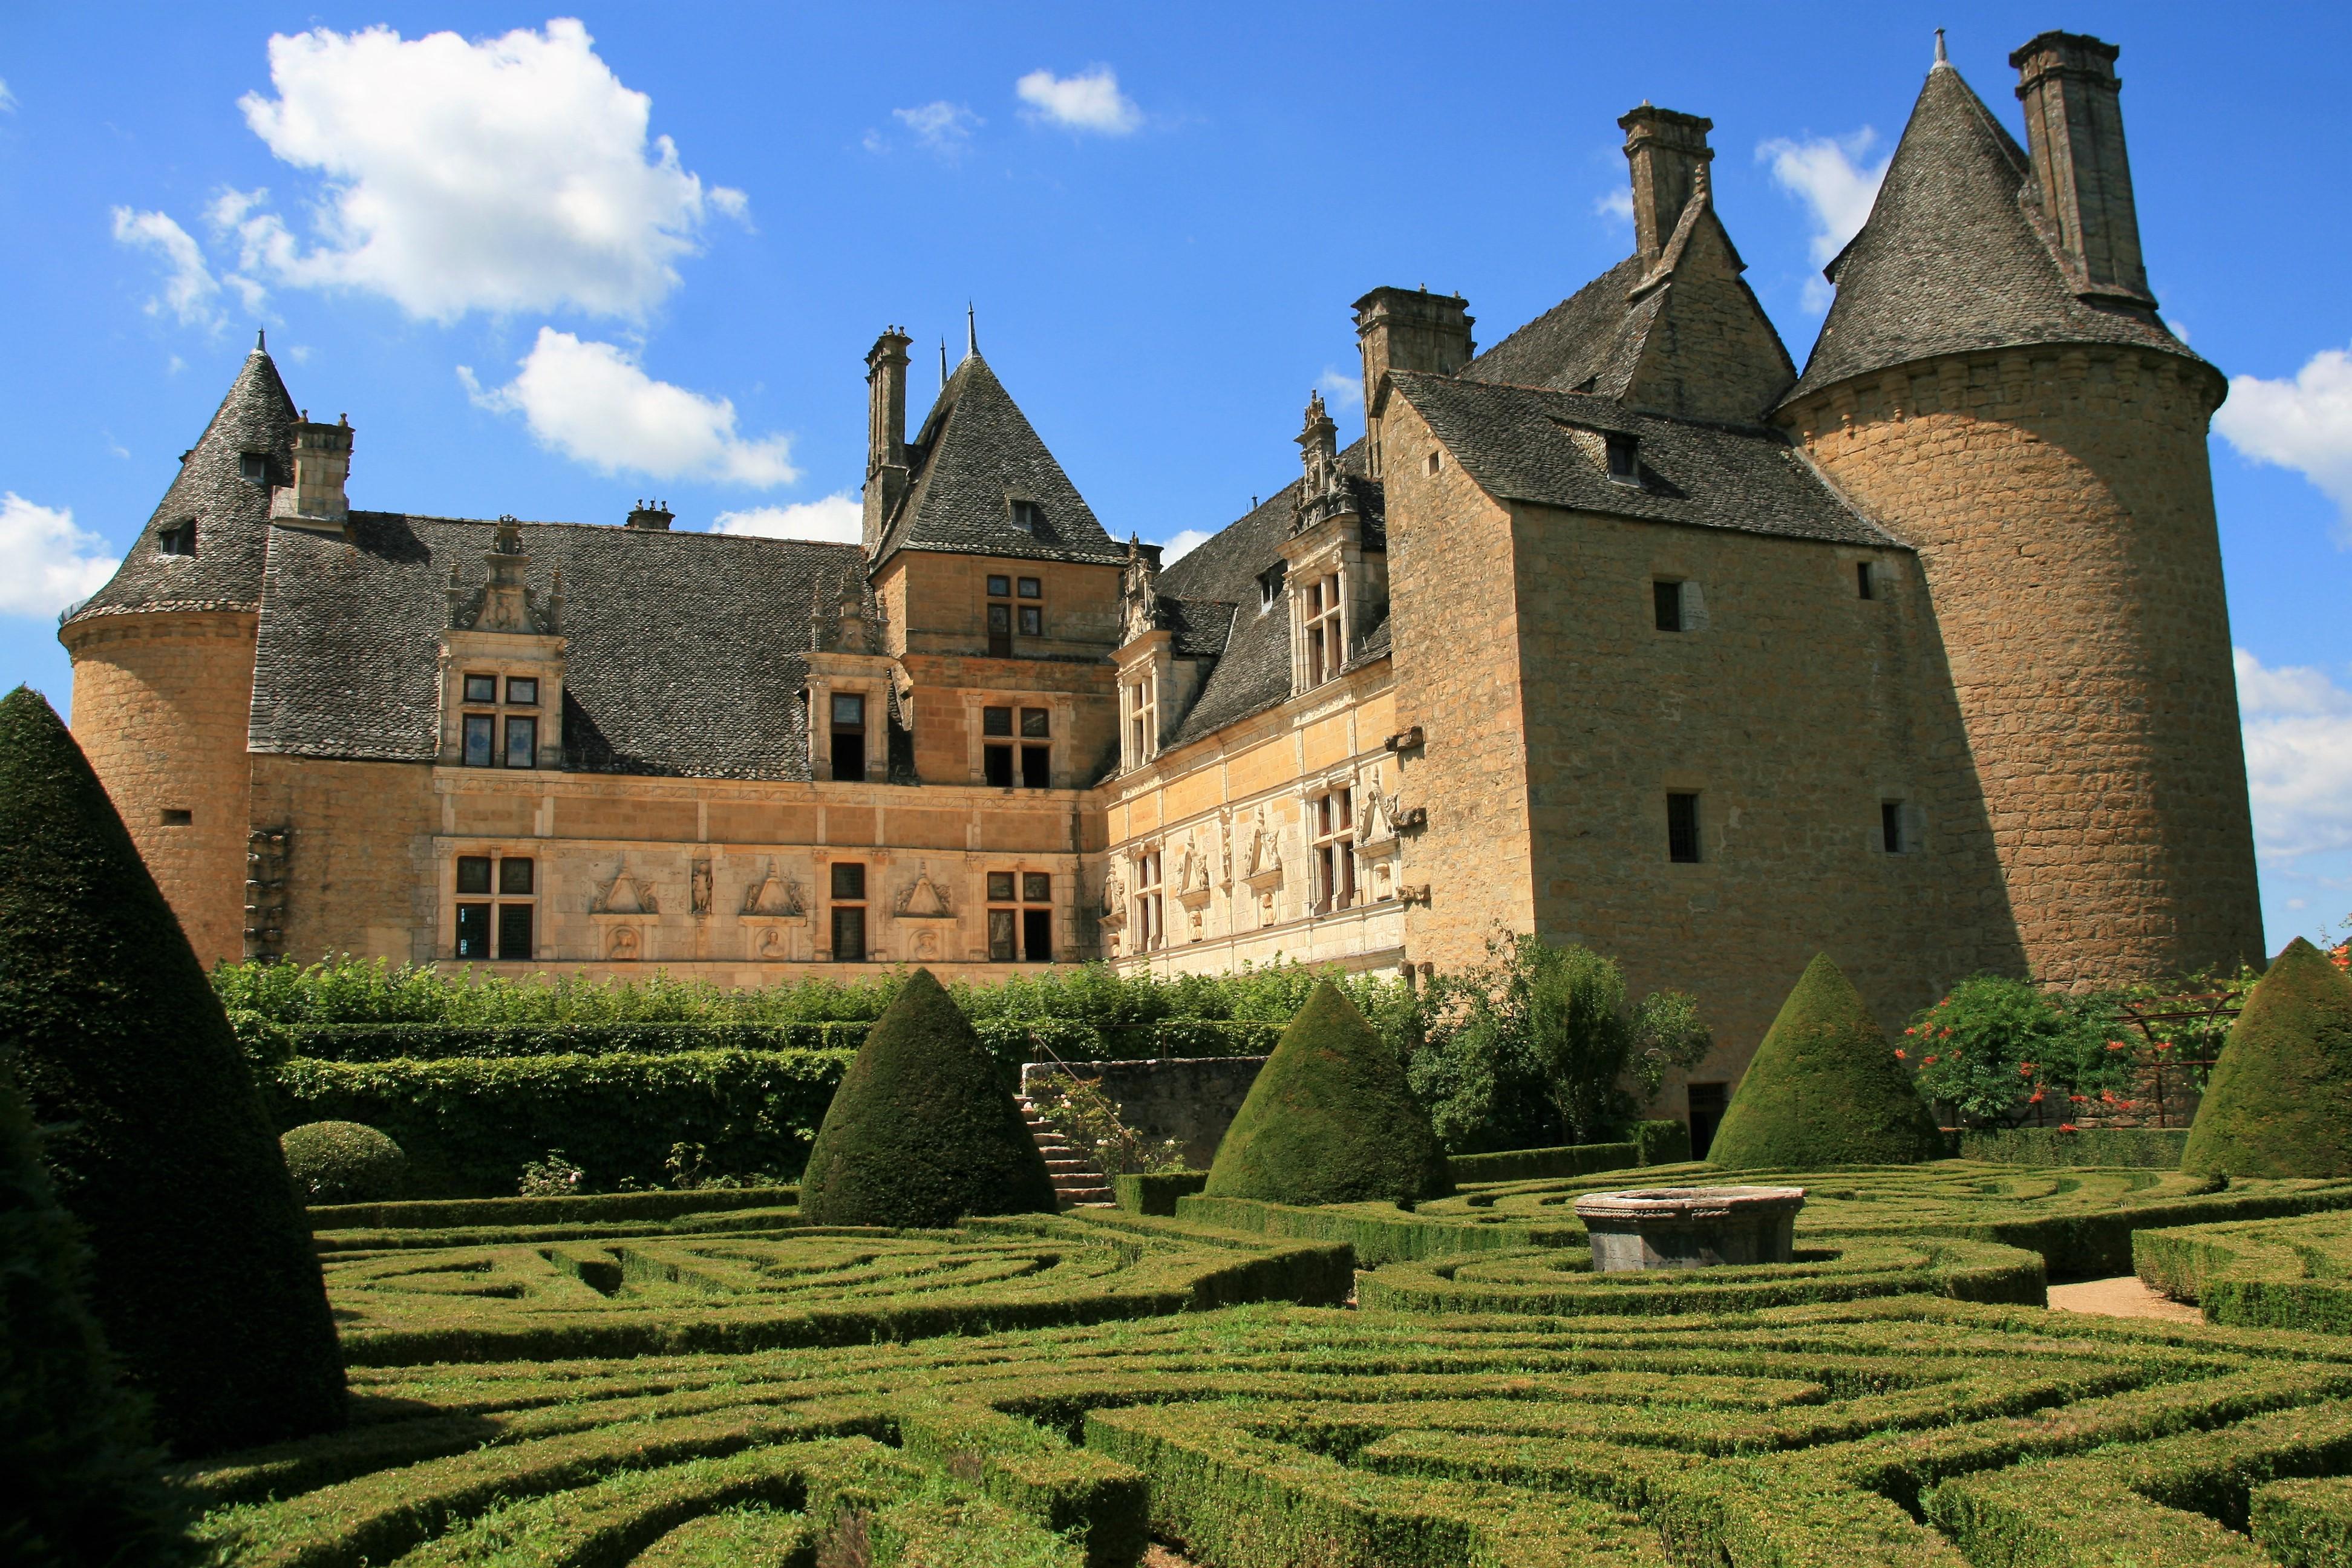 2218-chateau_de_montal_46.jpg